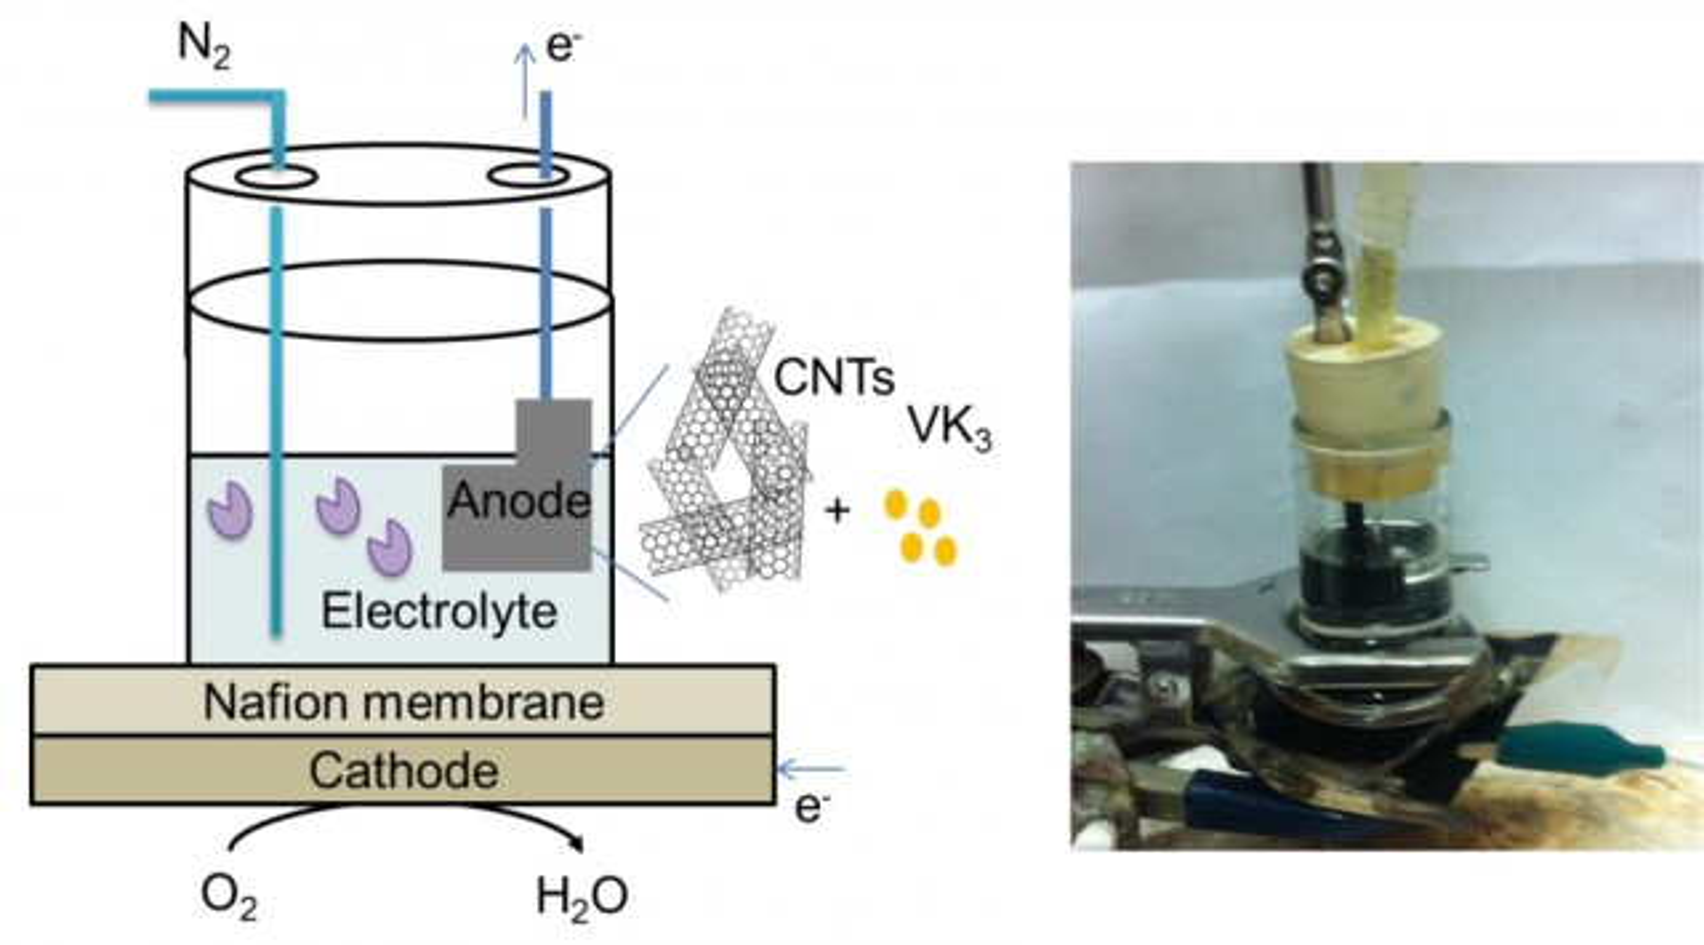 Enzymatic fuel cell diagram